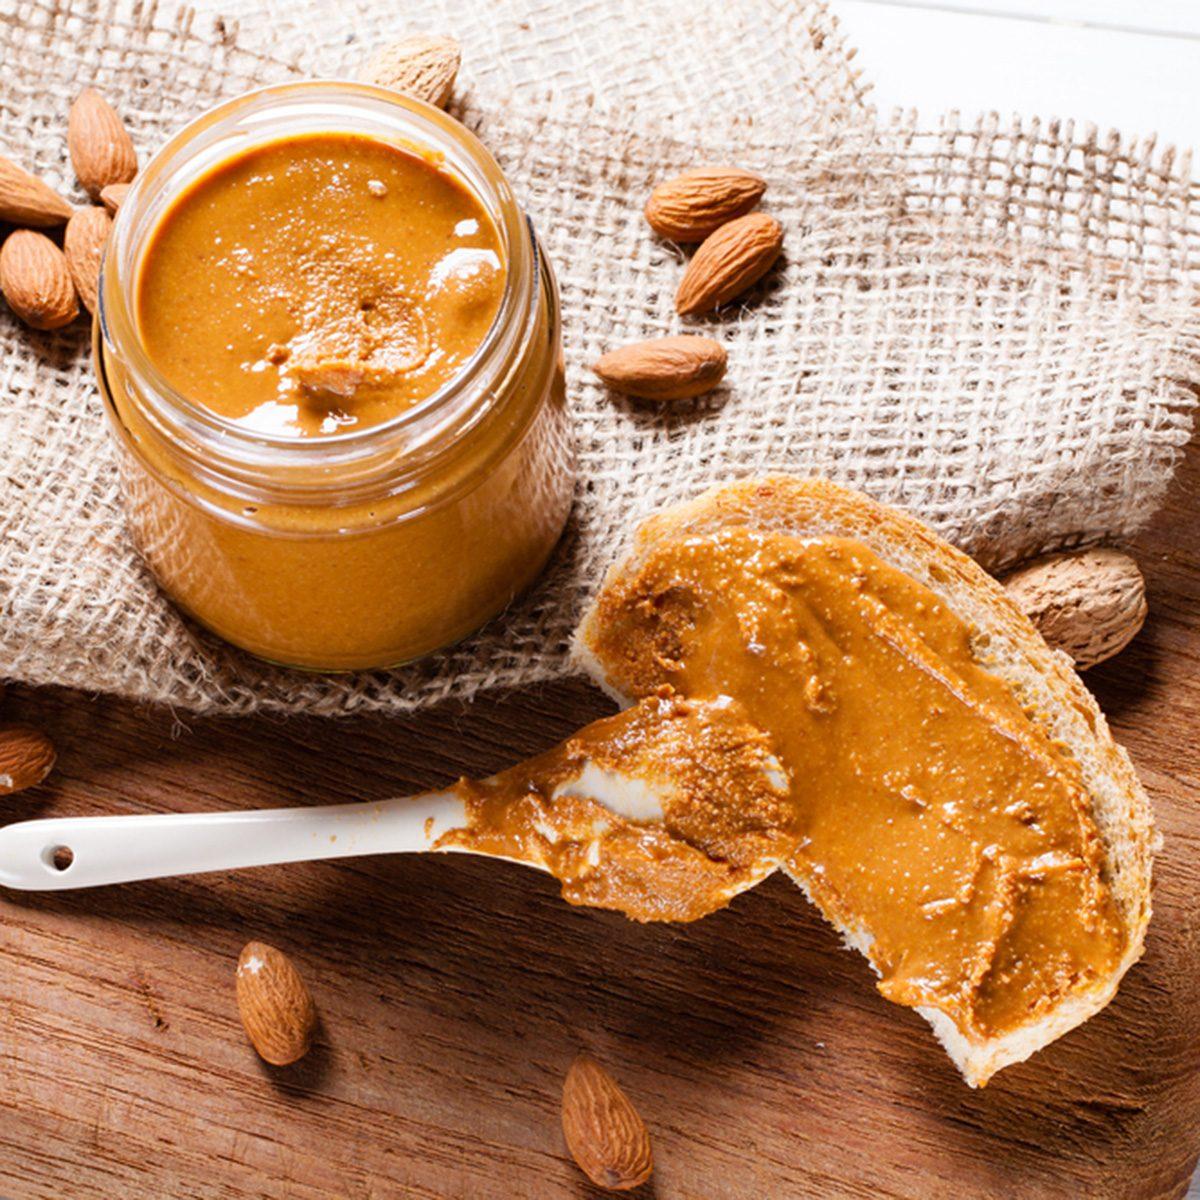 Homemade almond butter in jar on cutting board.